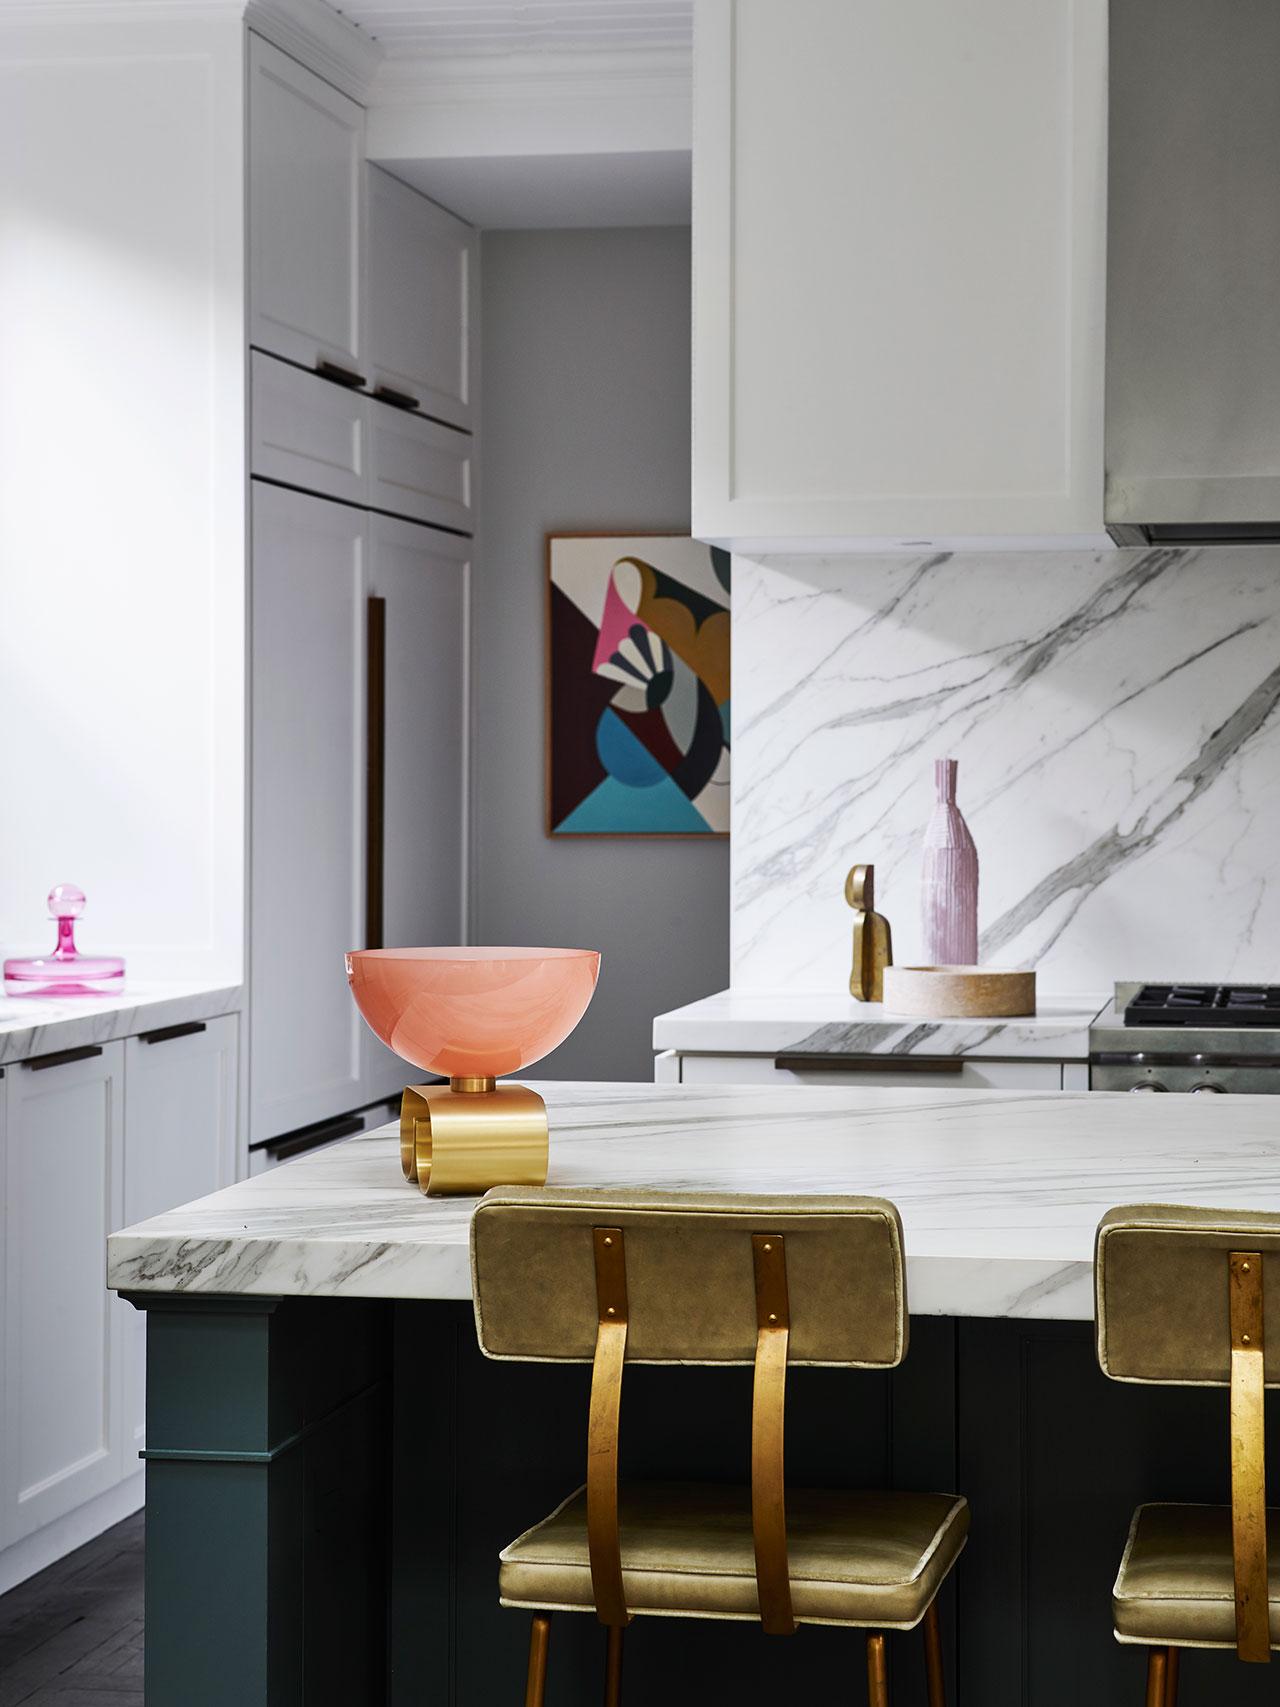 Art House by Studio CD - Claire Driscoll Delmar. Kitchen. Photo by Anson Smart.